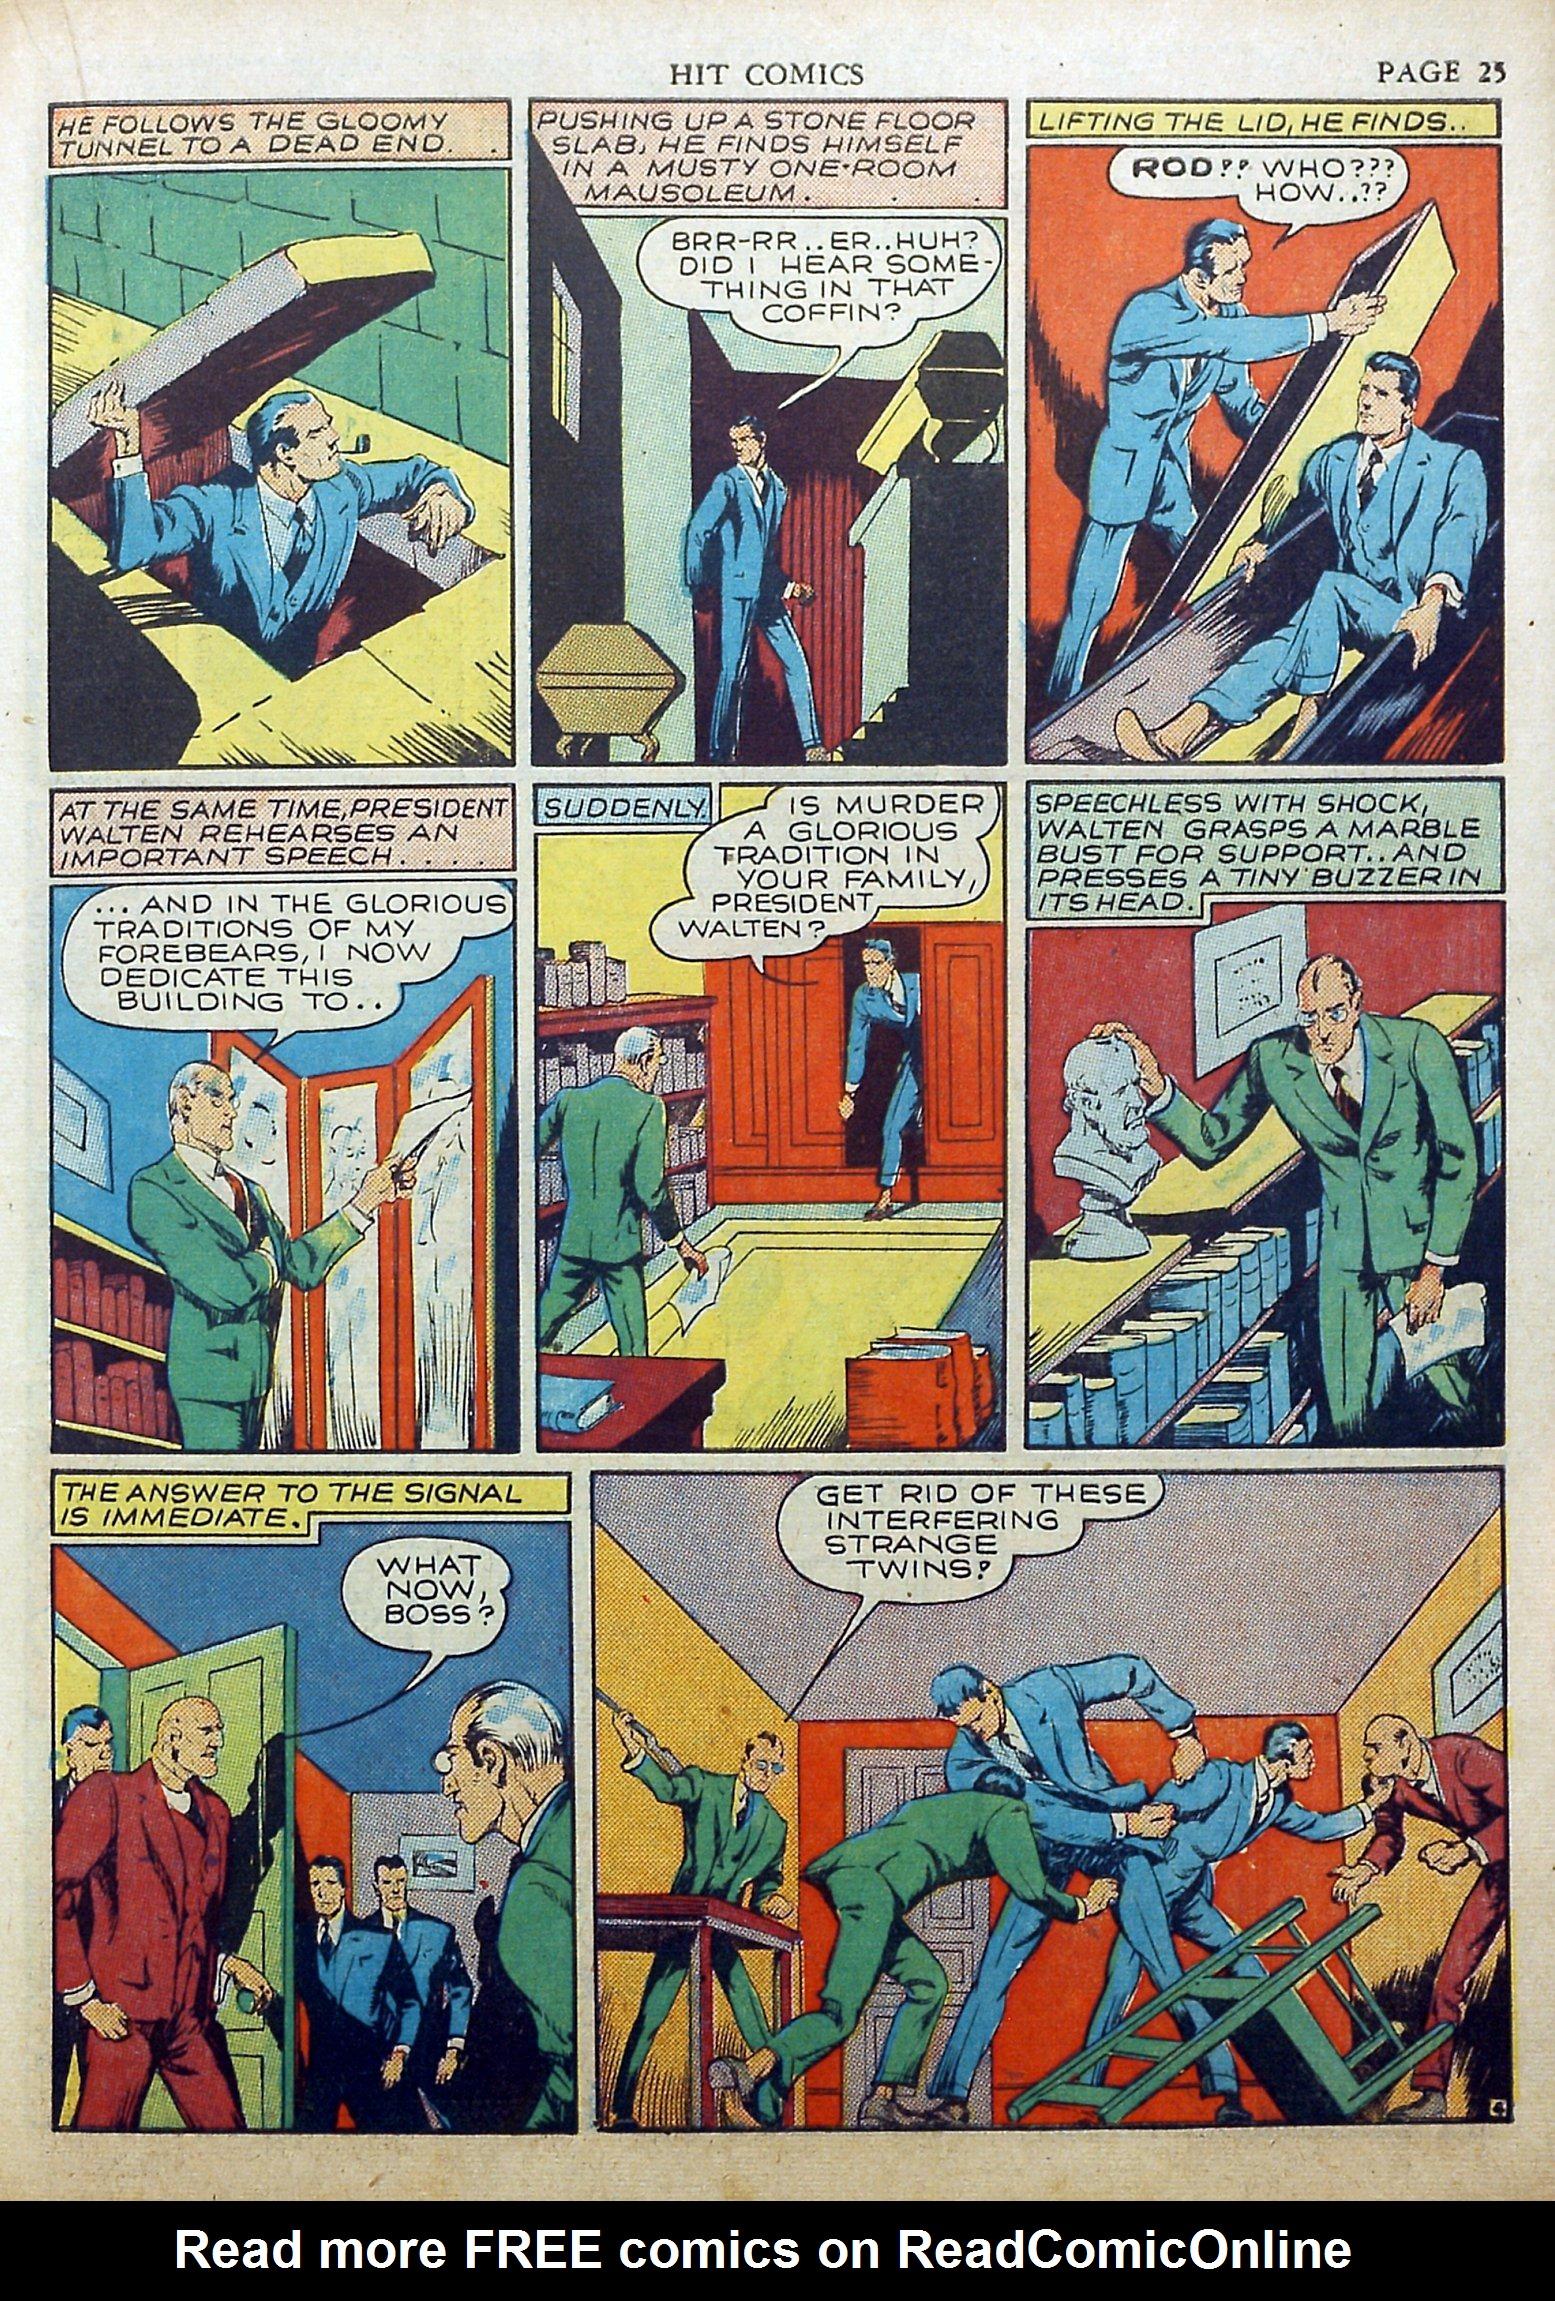 Read online Hit Comics comic -  Issue #17 - 27